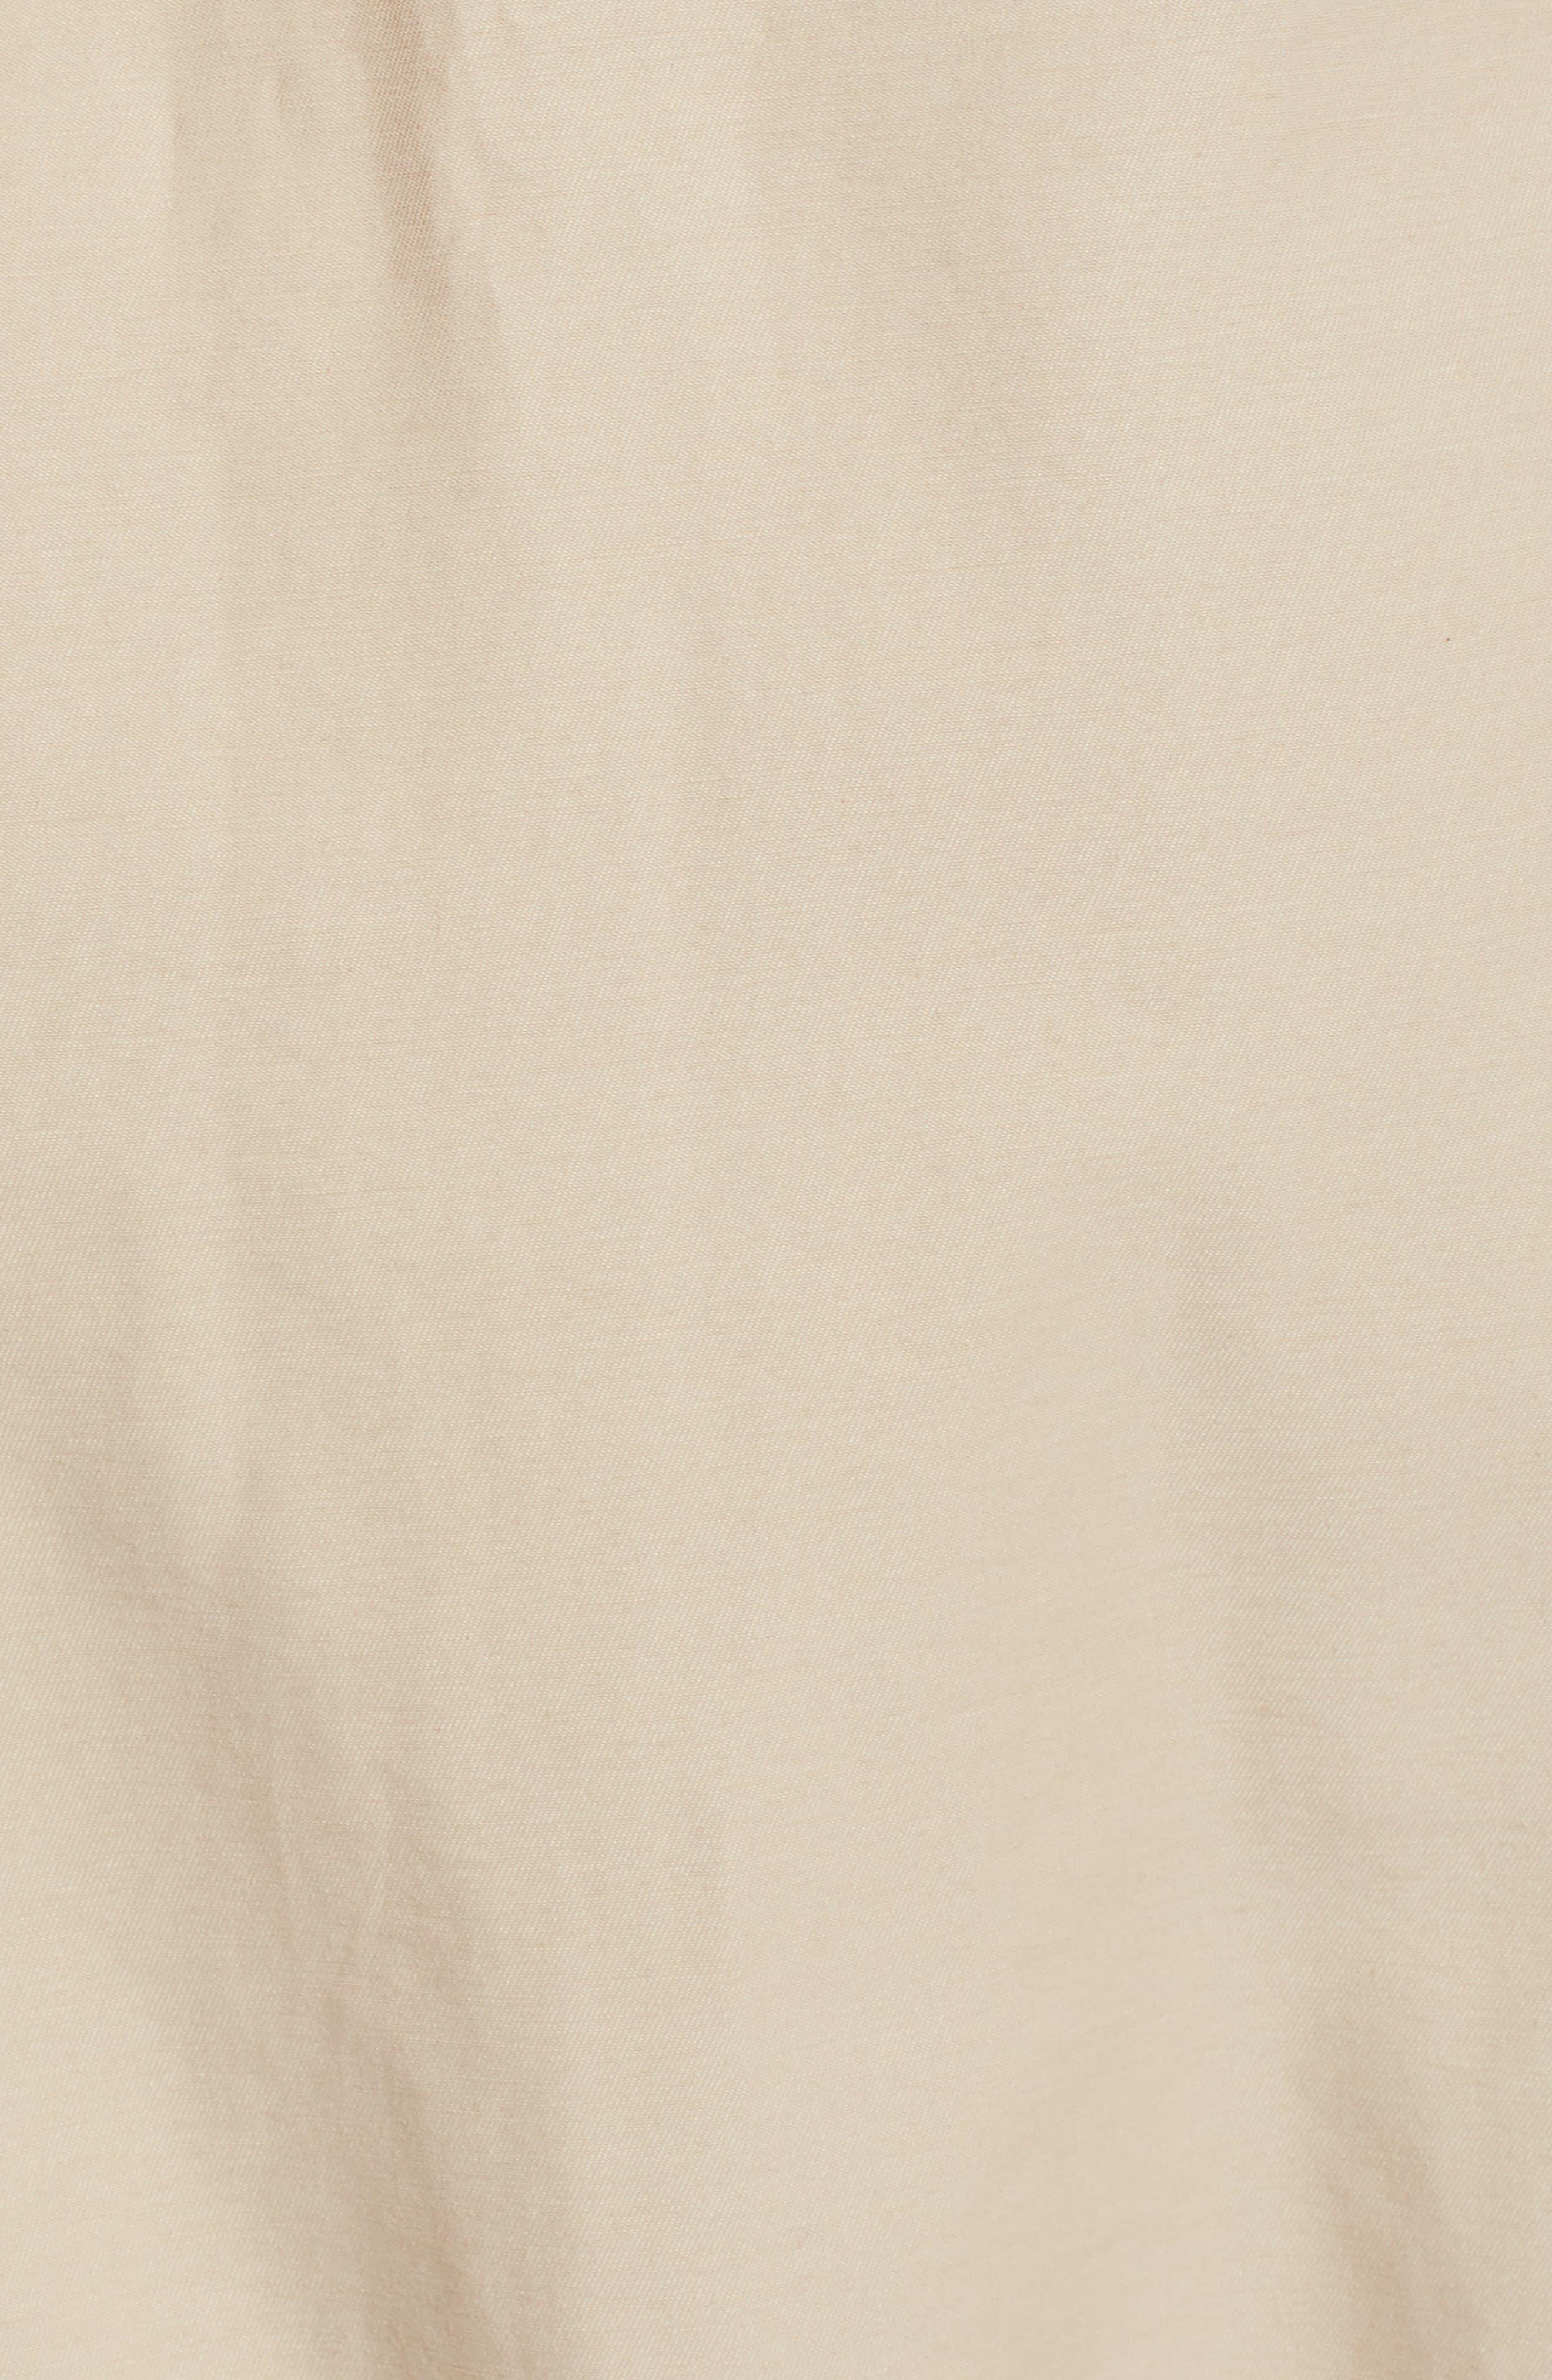 Ruffle Front Skirt,                             Alternate thumbnail 5, color,                             Tan Thread